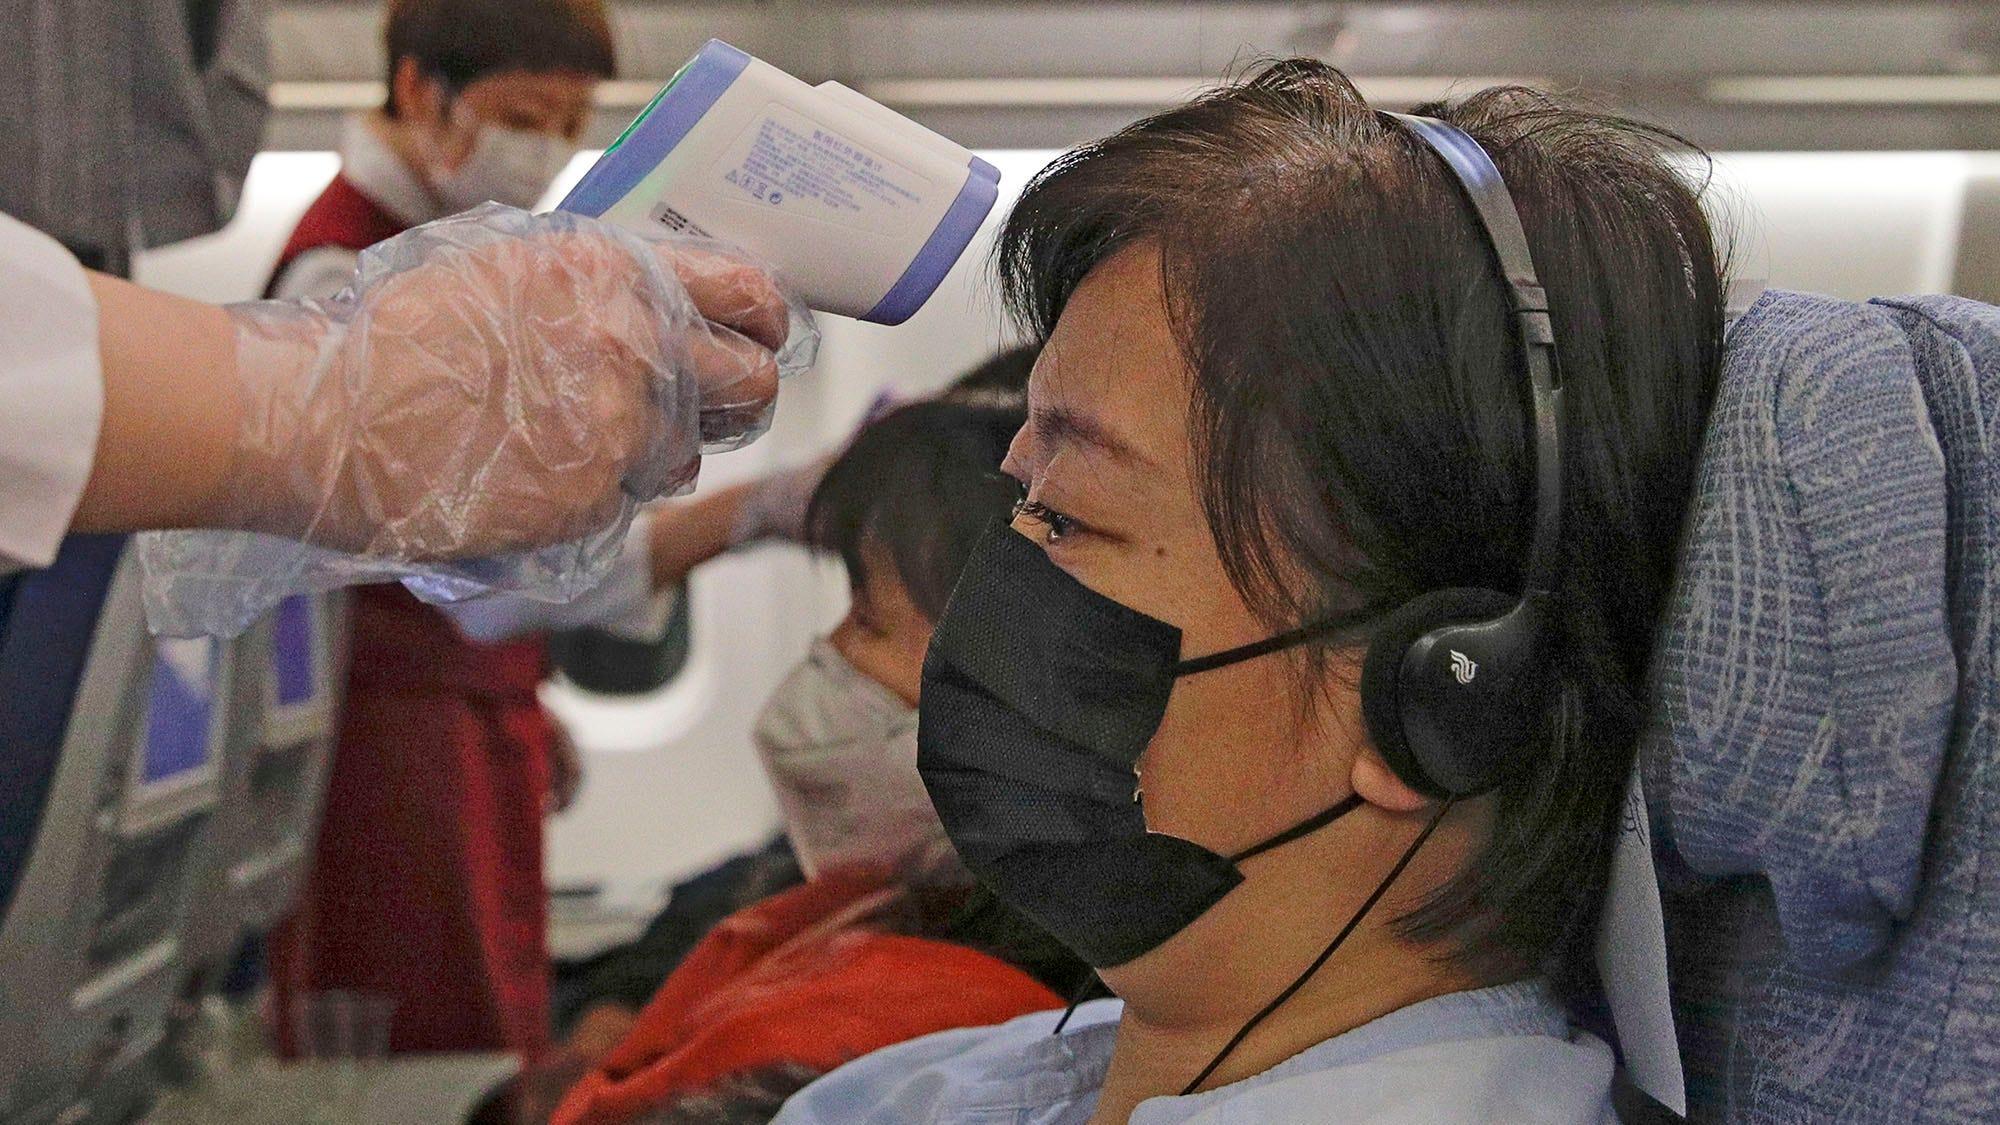 United, American Airlines drop flights to Hong Kong amid coronavirus outbreak